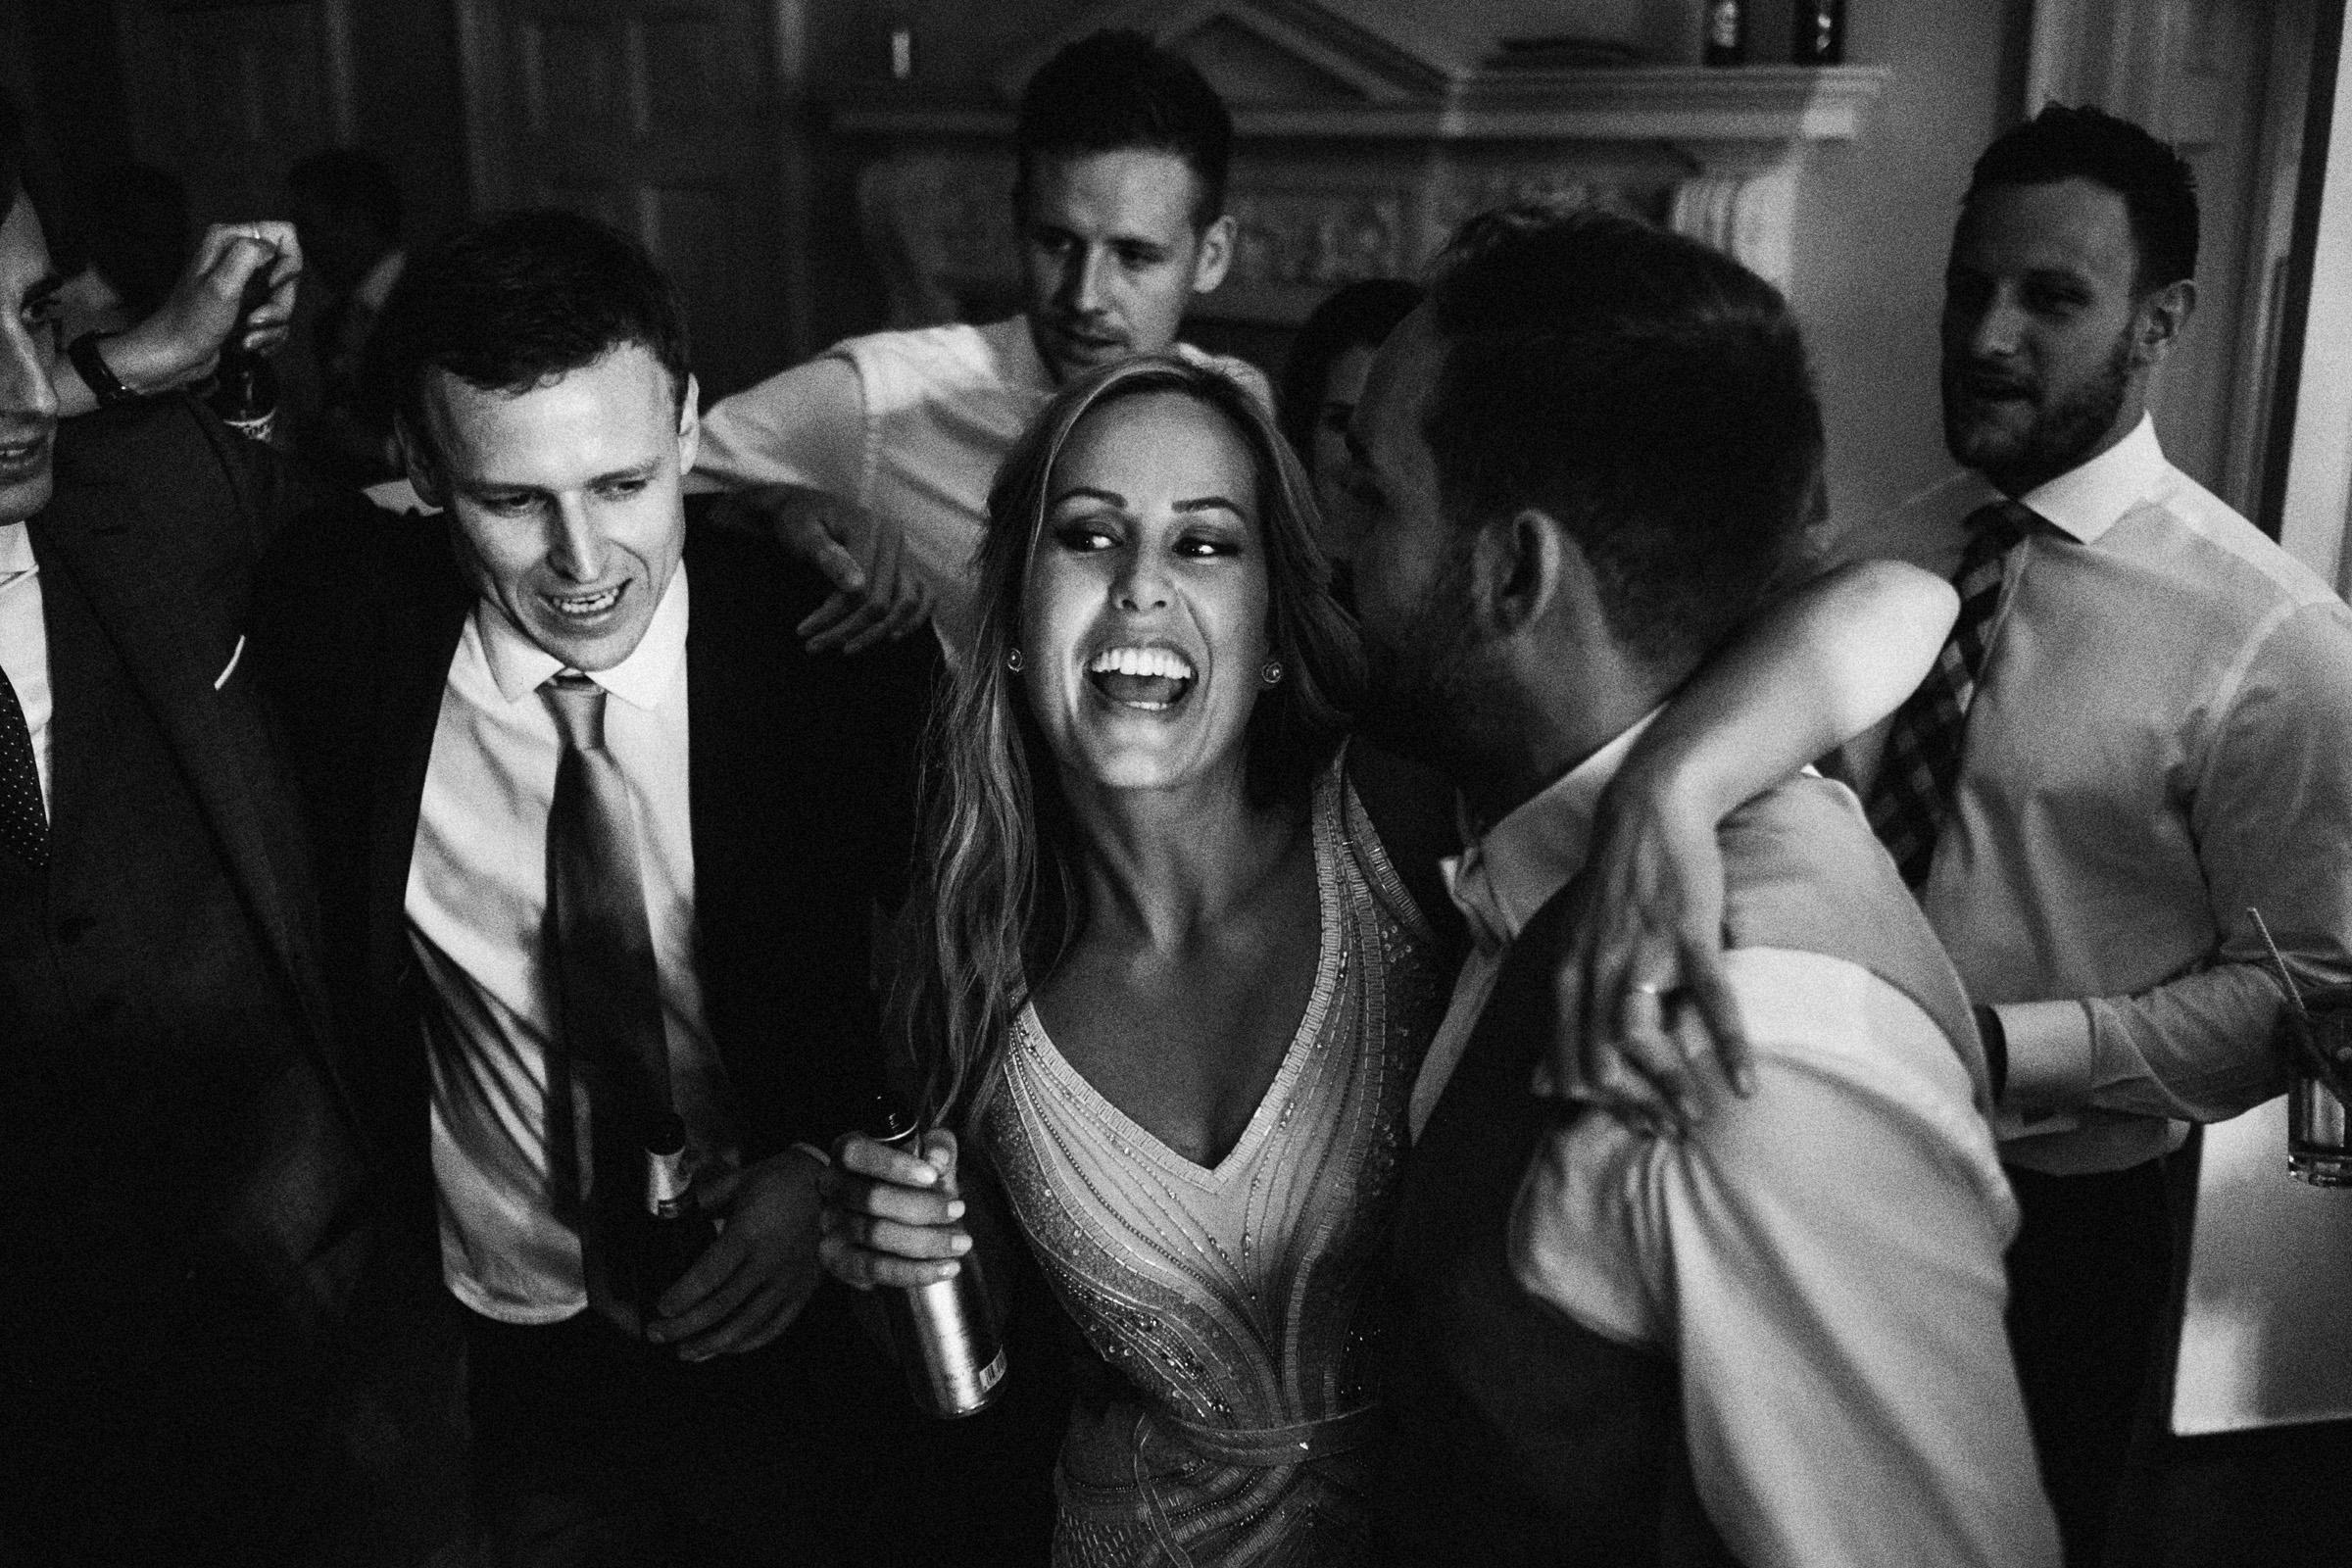 Morden Hall reception dancing - photo by York Place Studios